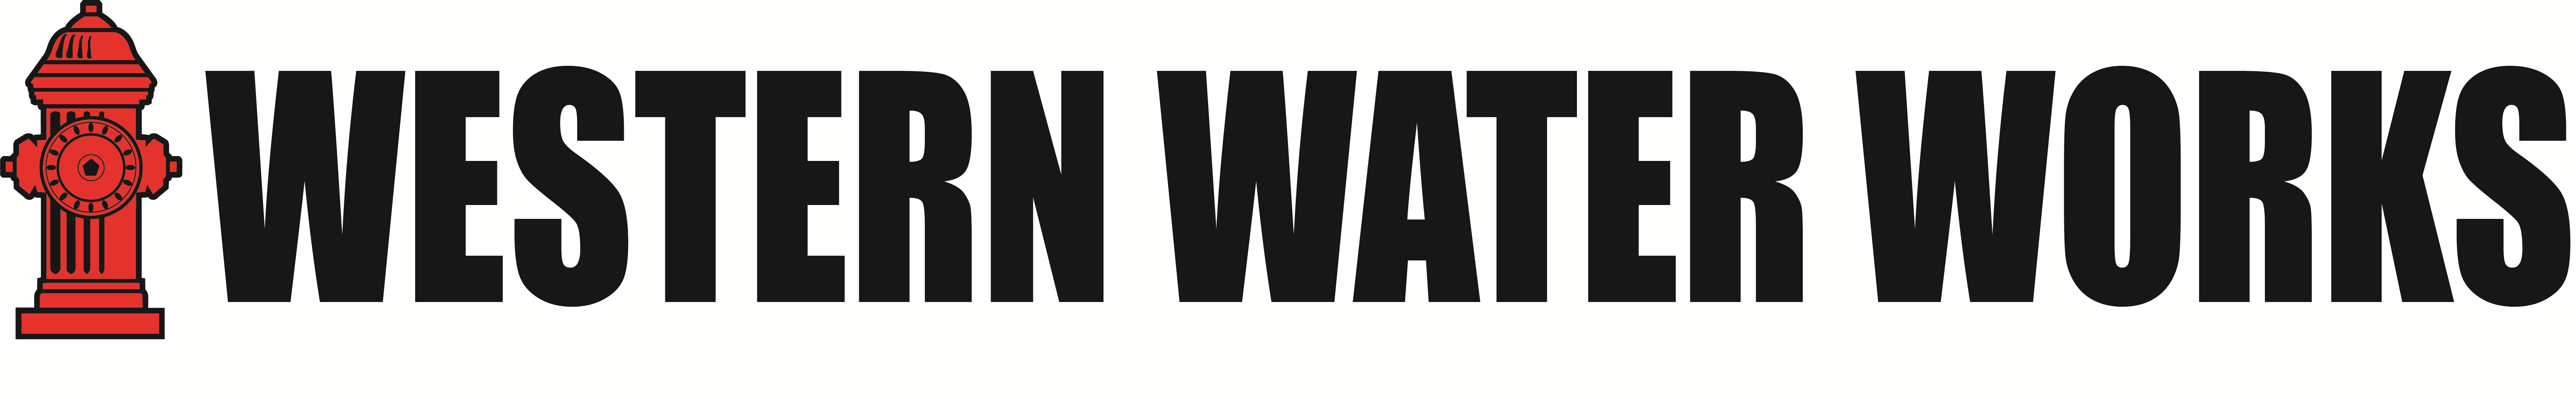 Western Water Works Company Logo